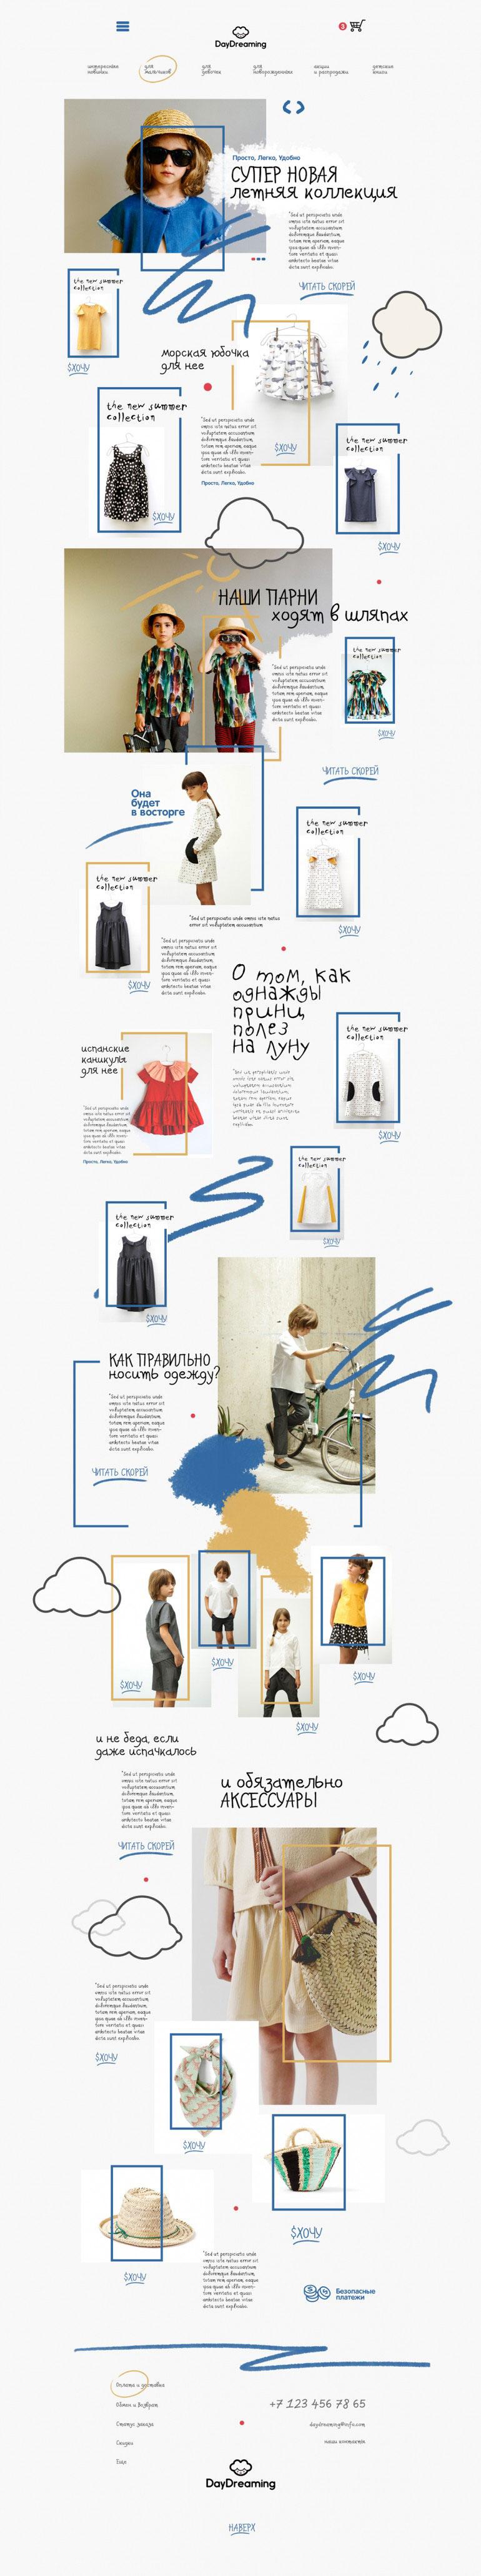 Creative_Website_Design_Inspiration_2016_003